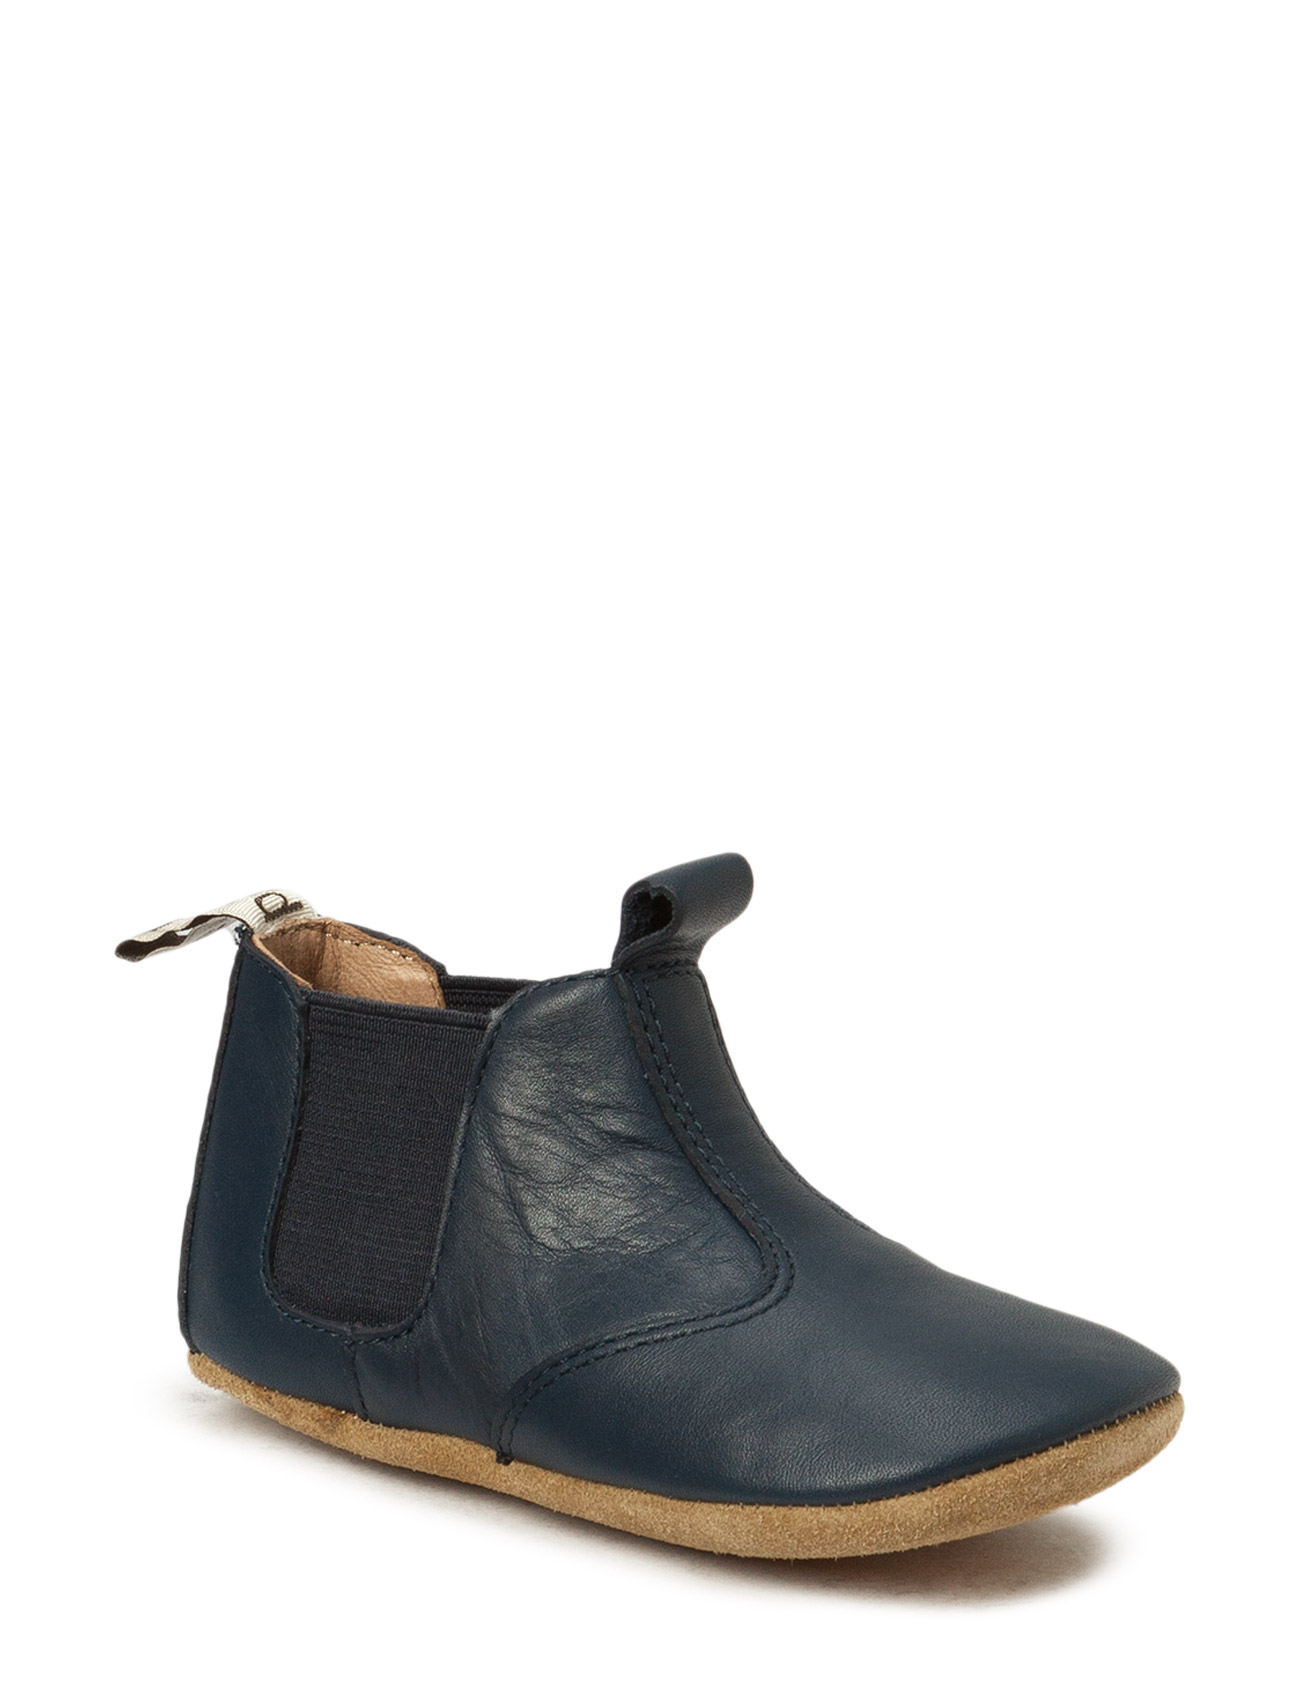 9a137d23ef3 Chelsea Home Shoe (21 Navy) (379 kr) - Bisgaard - | Boozt.com